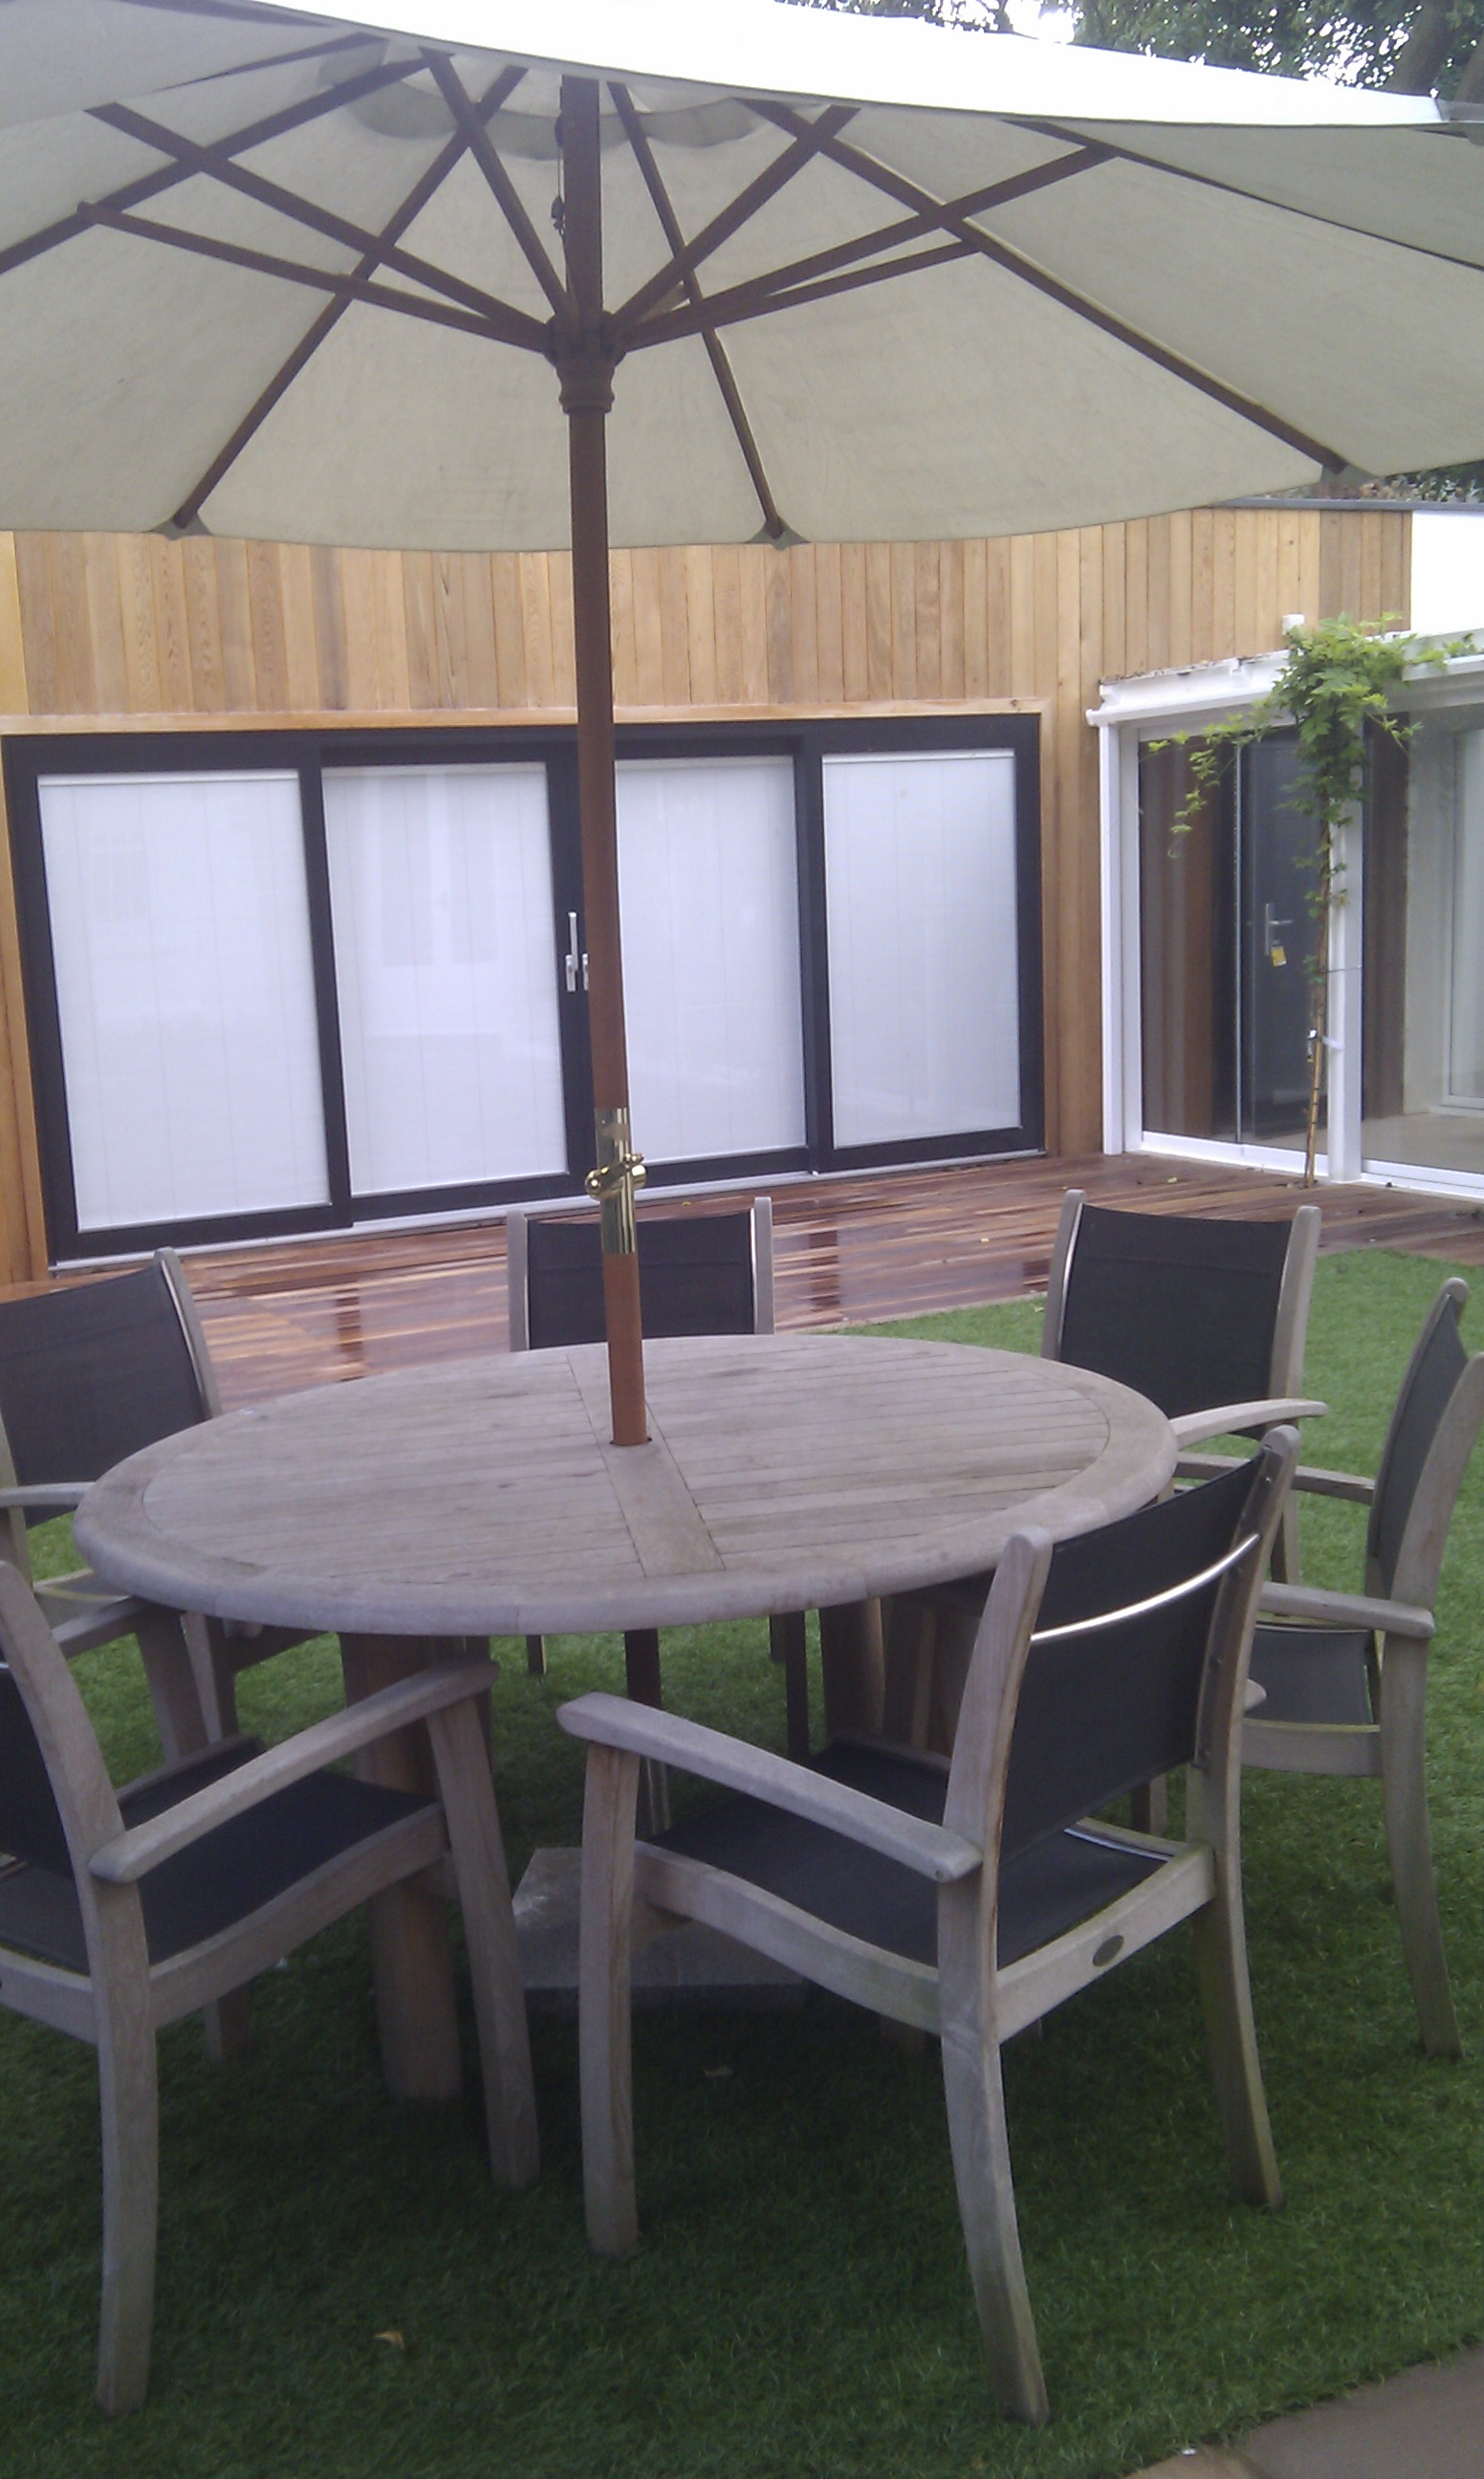 modern garden design london slatted grey privacy screen sandstone paving easy grass balau hardwood decking (39)